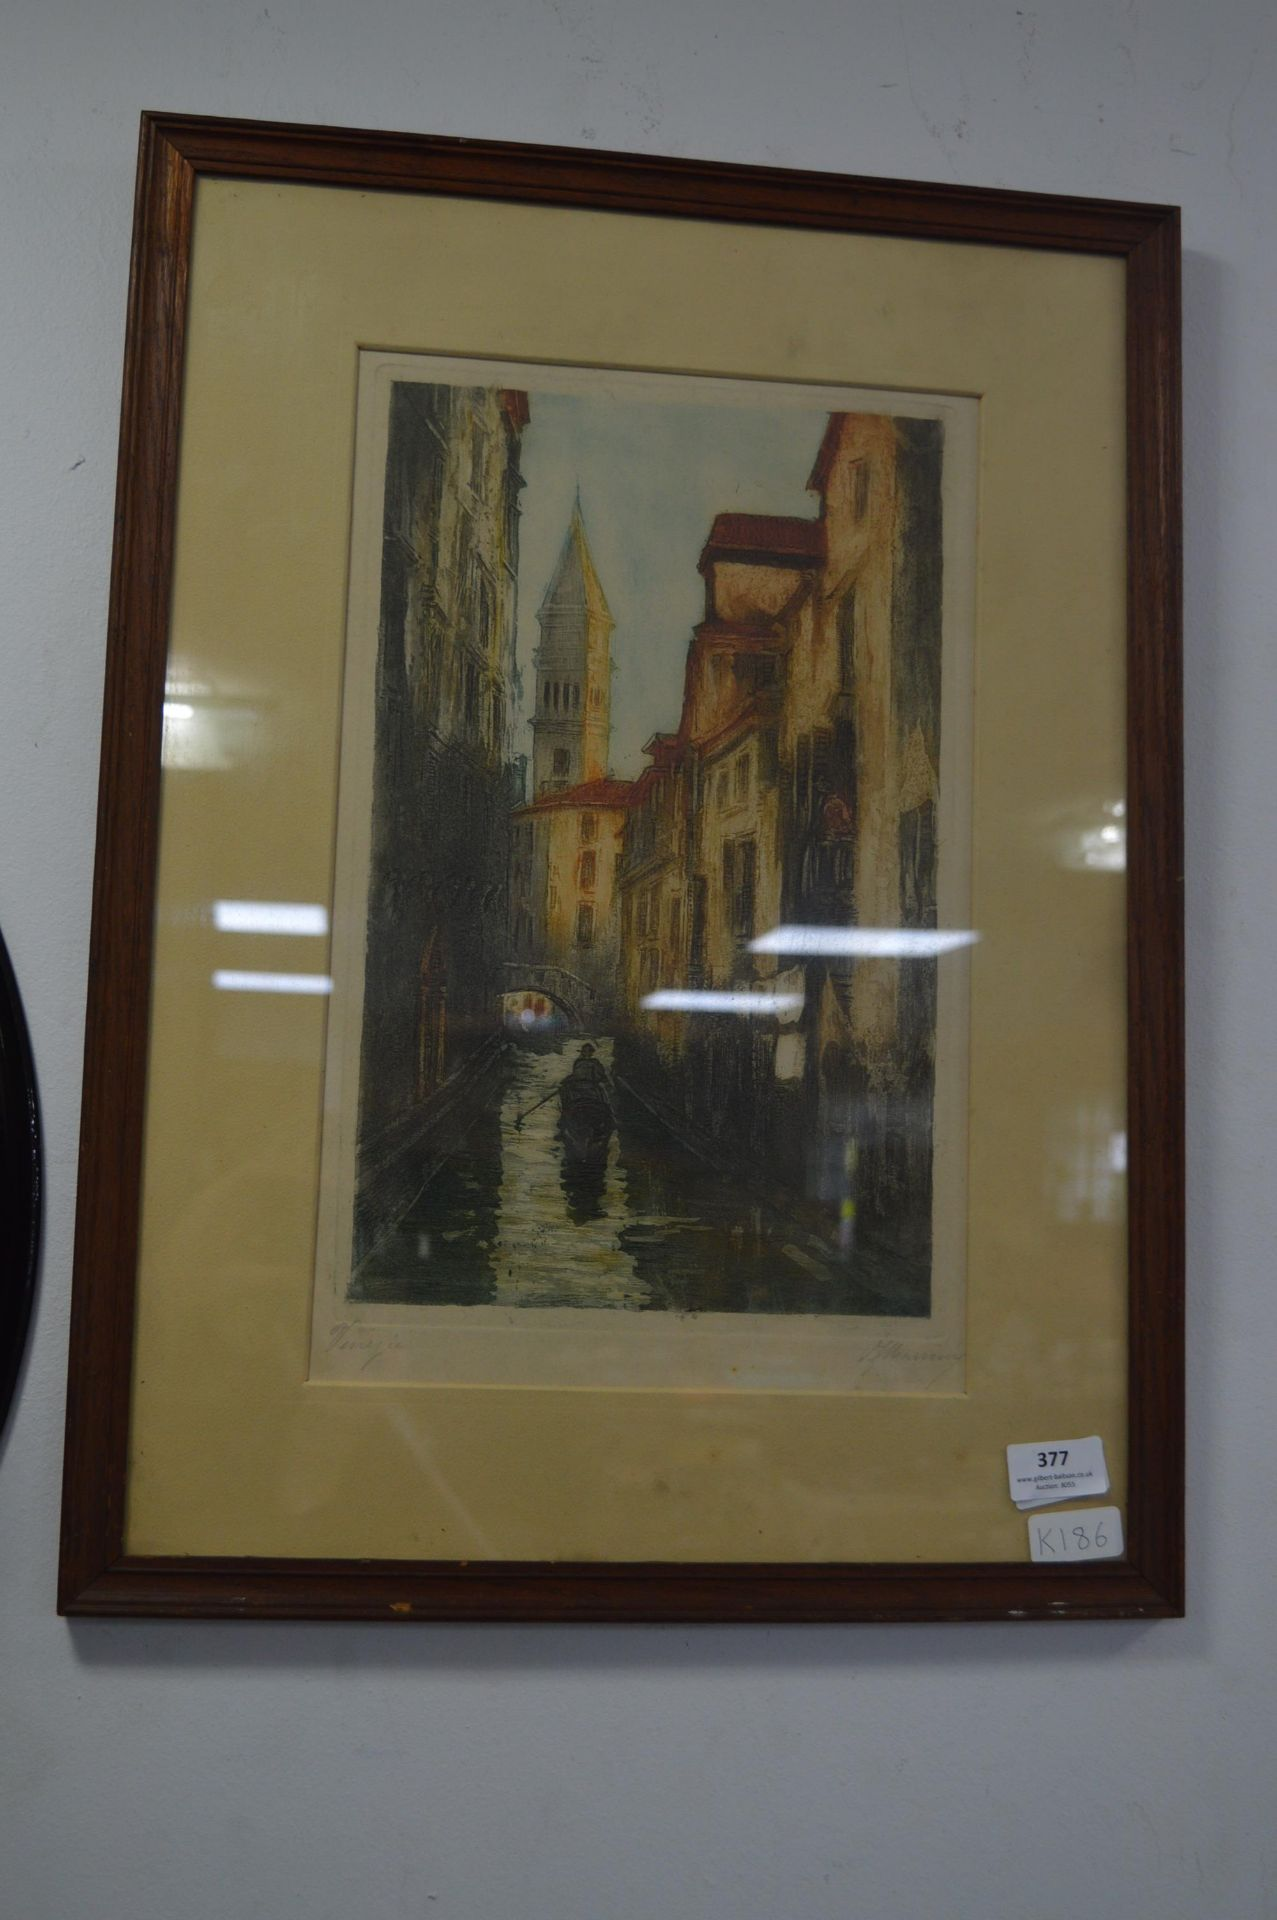 Lot 377 - Vintage Print of Venice